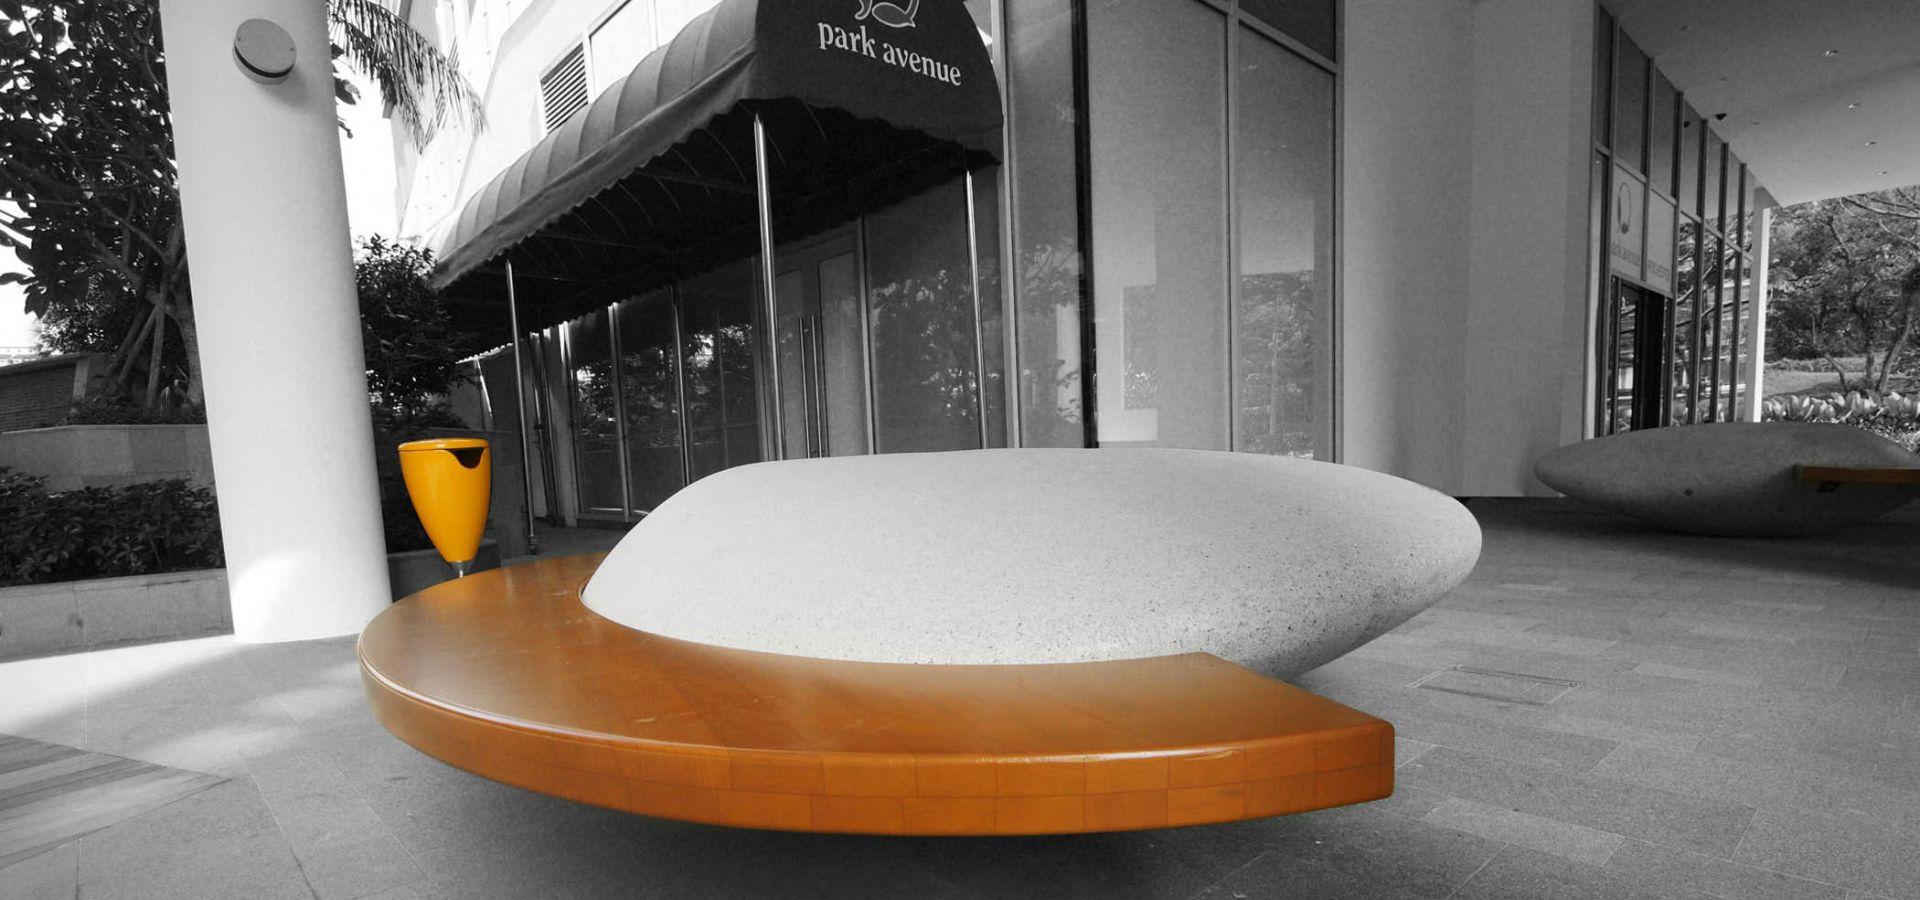 MOONSTONE Galet banc urbain béton original - Blanc ou Noir - Banquette bois│Metalco fabricant mobilier urbain design